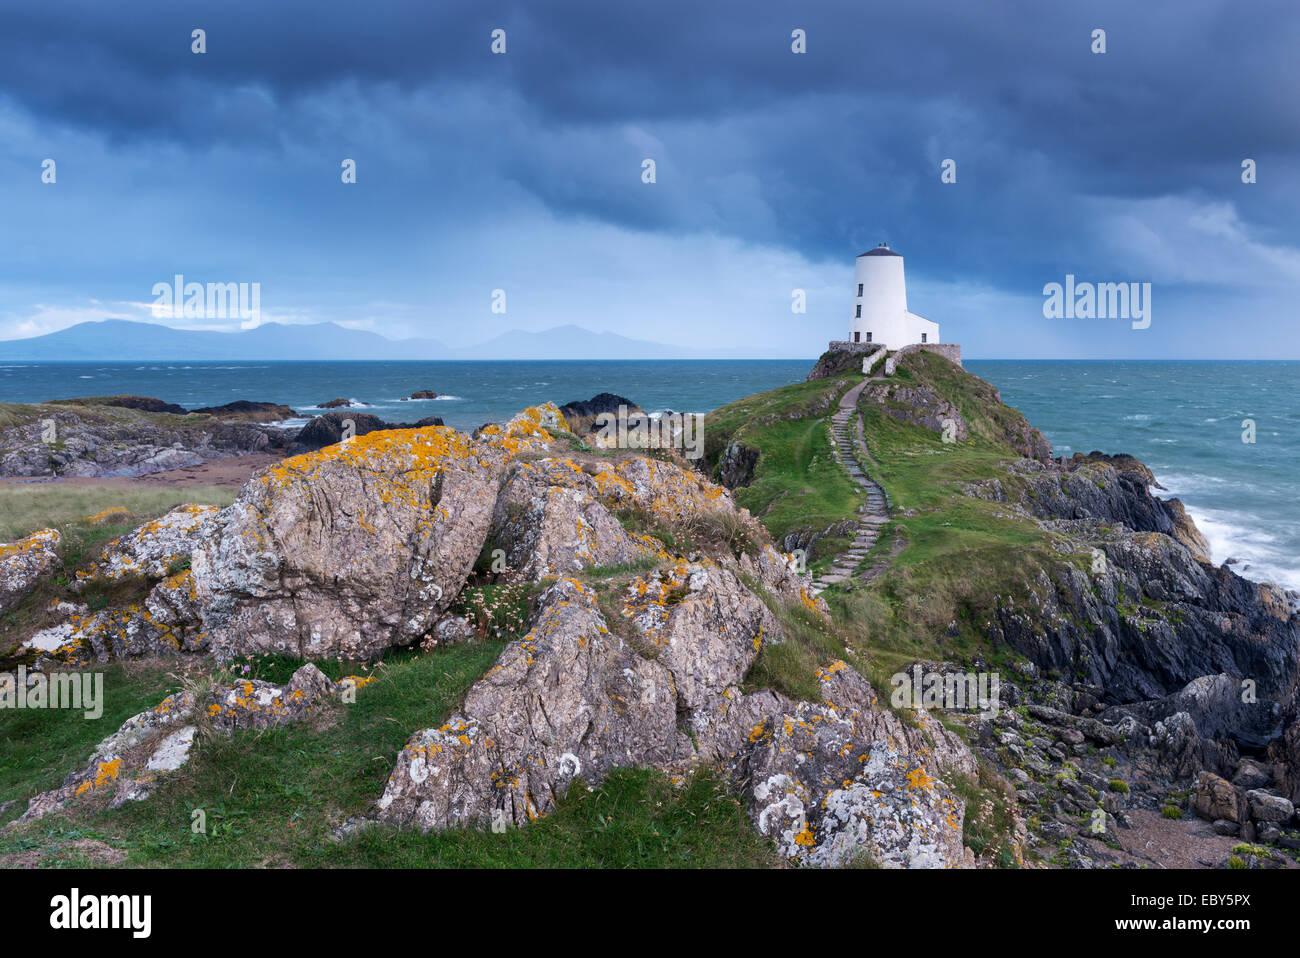 Twr Mawr lighthouse on Llanddwyn Island, Anglesey, Wales. Autumn (September) 2013. - Stock Image